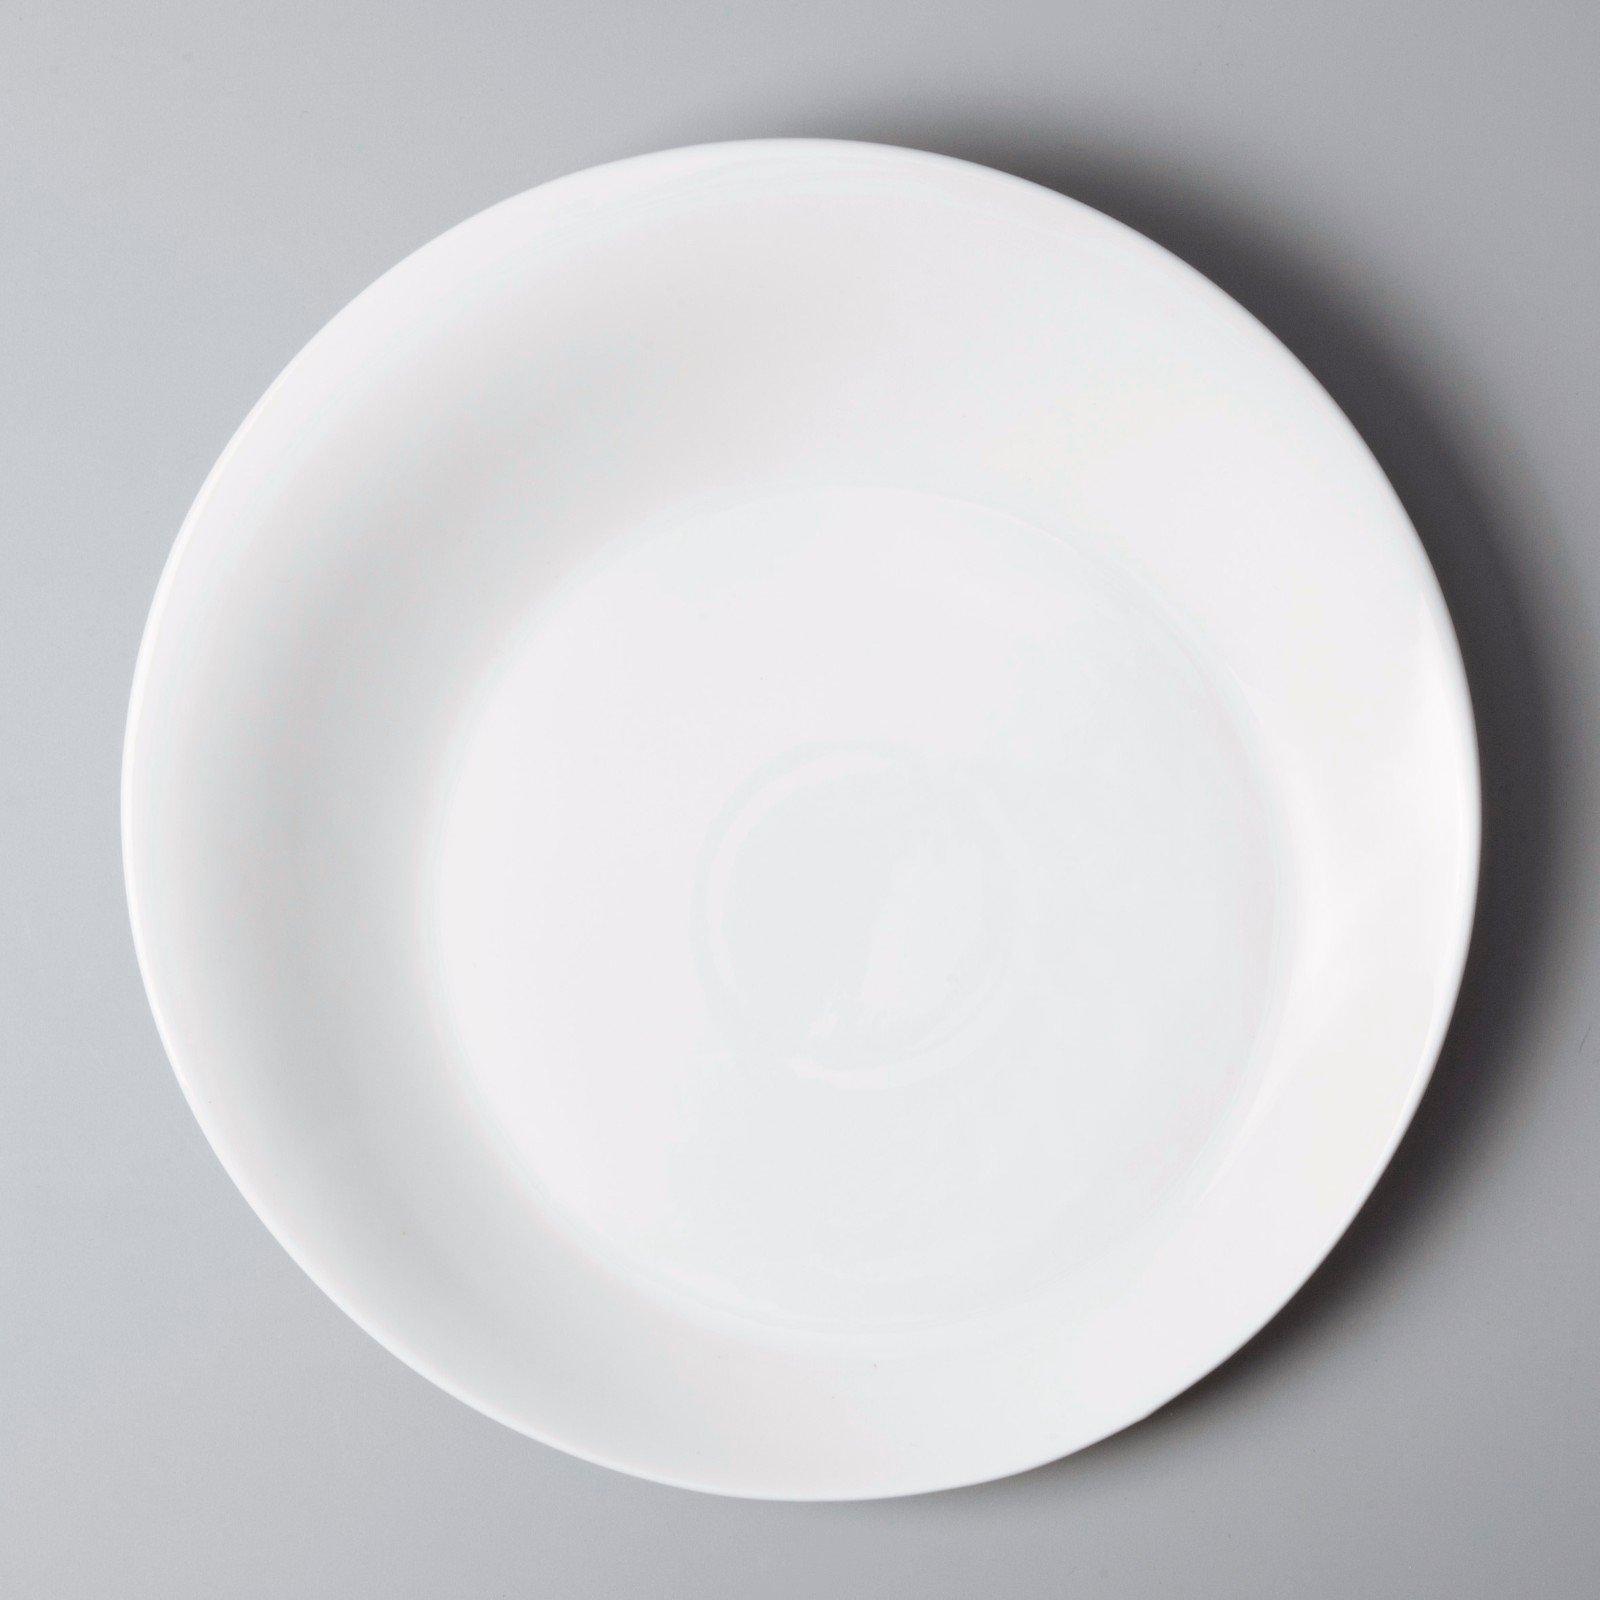 Two Eight Brand dish porcelain white porcelain tableware